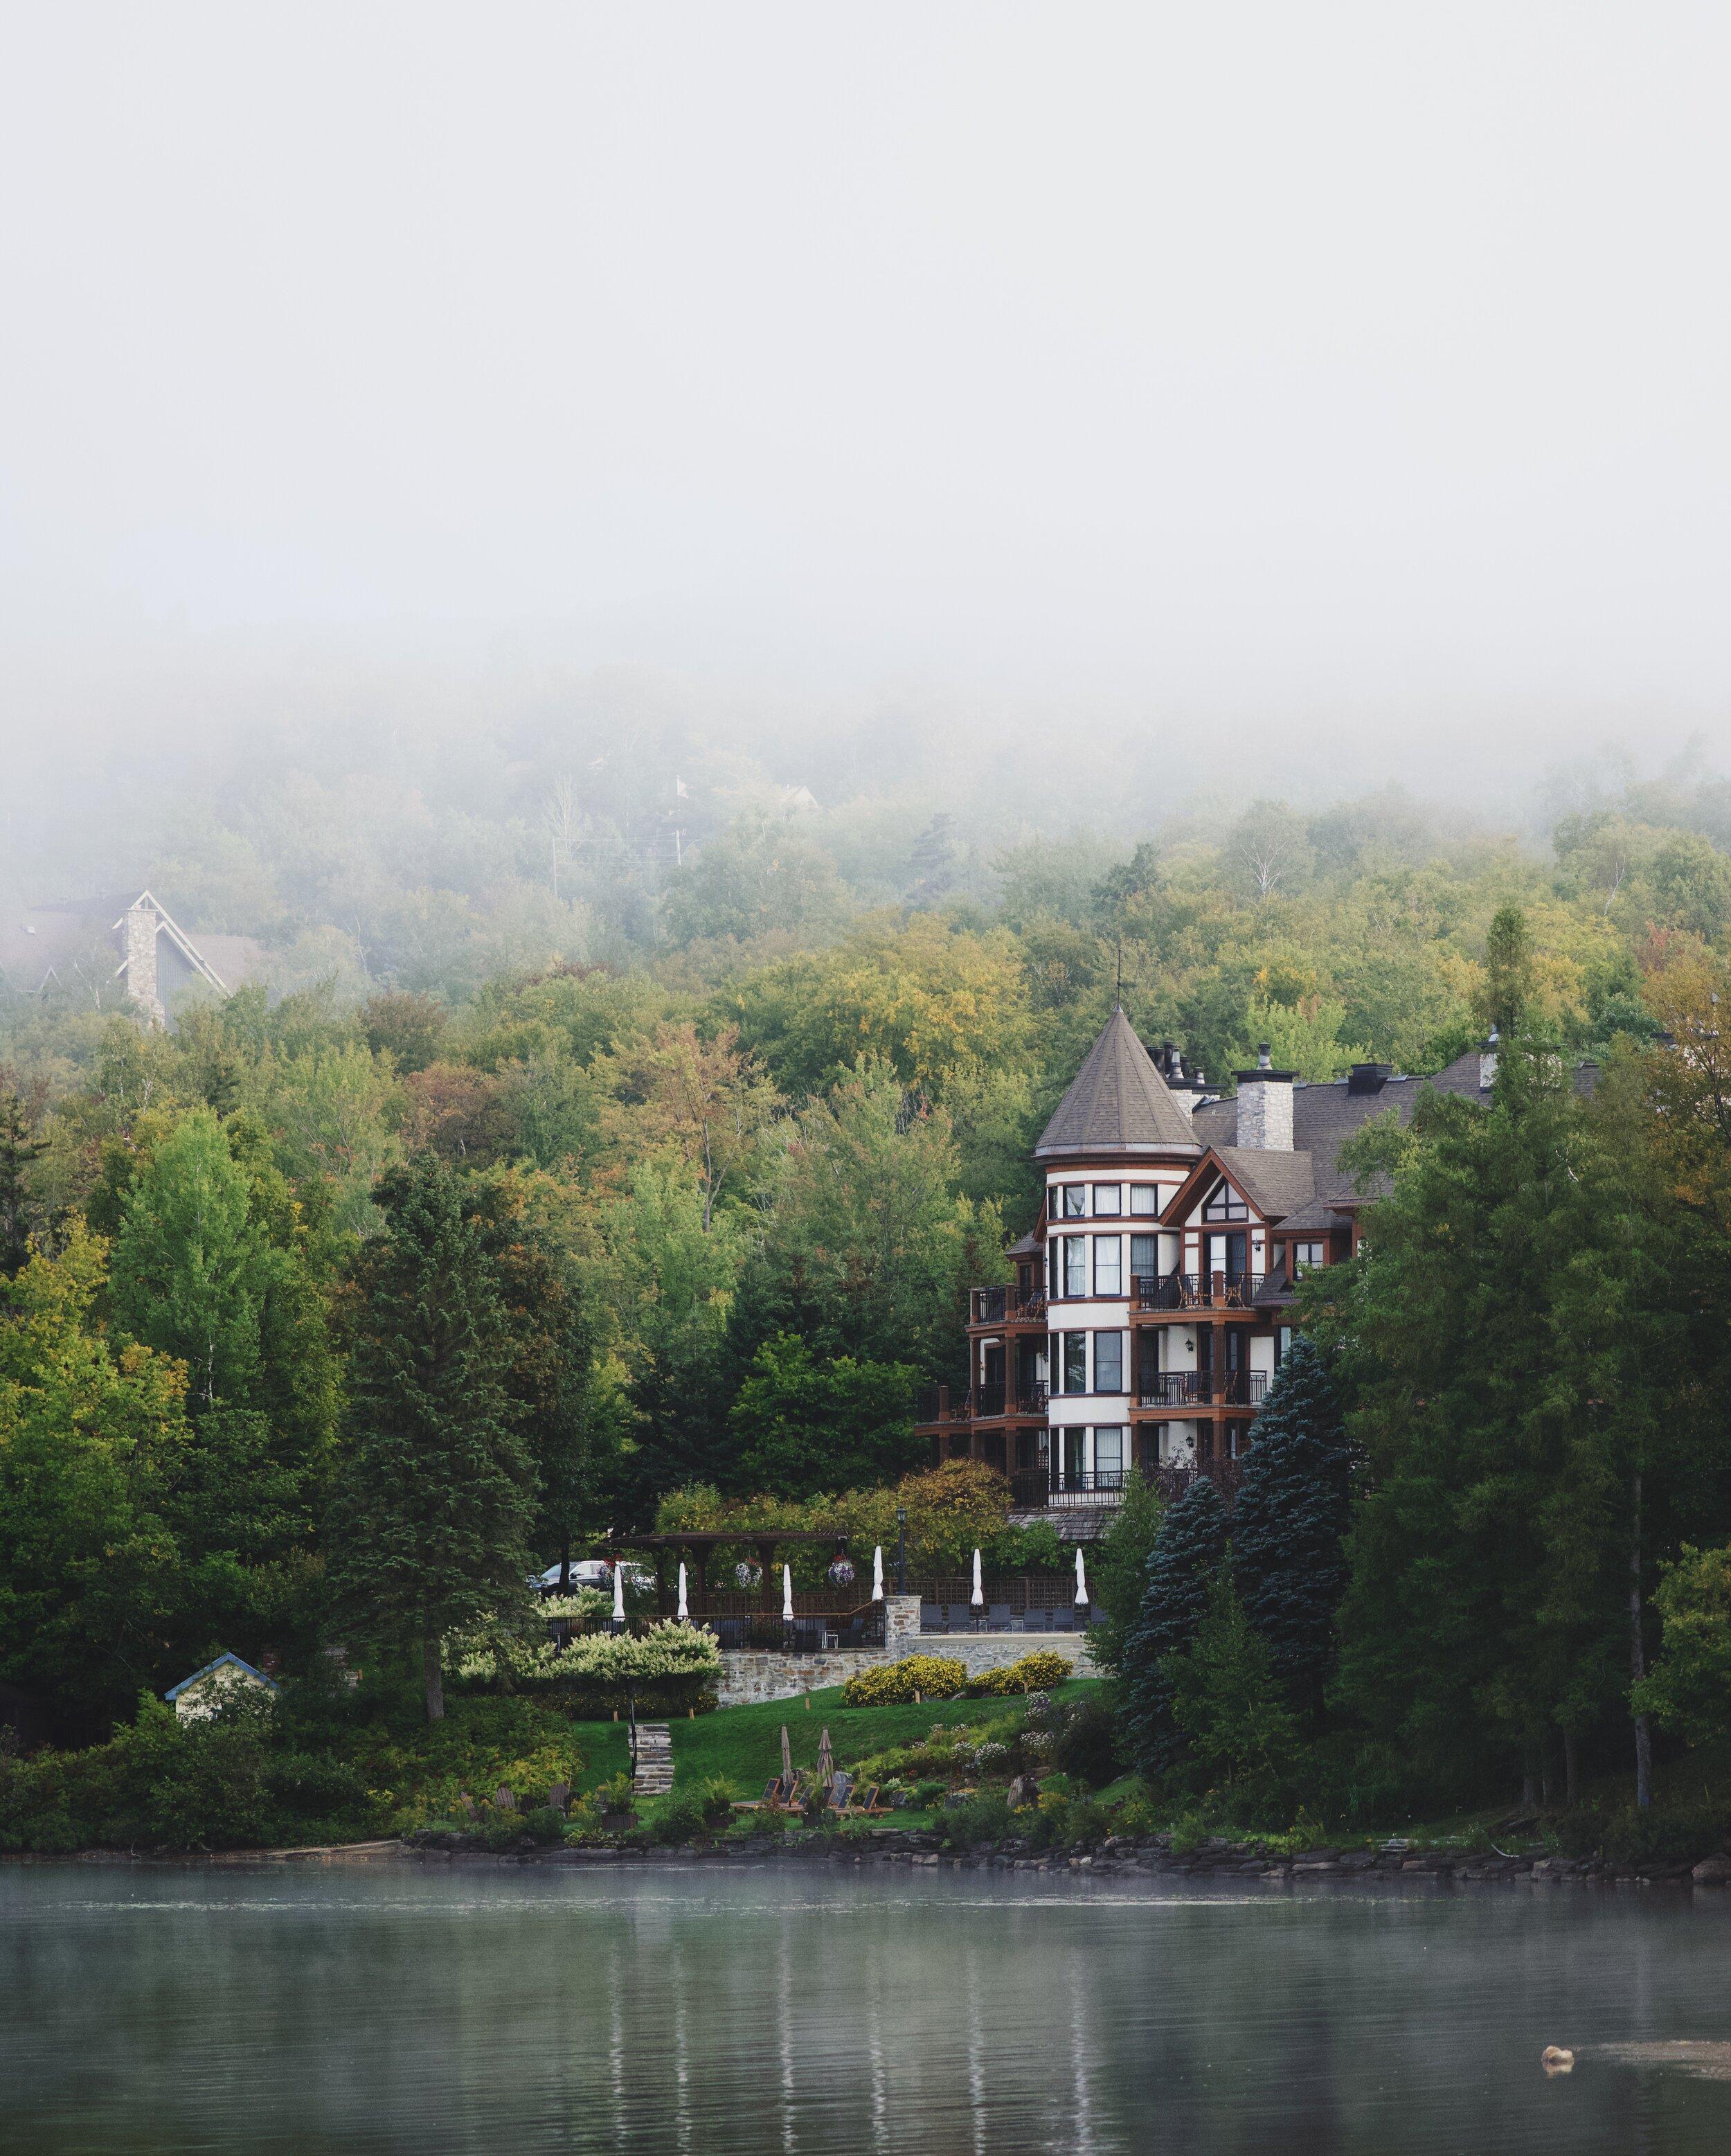 Quintessence Hotel | Photo by Sacha Leclair